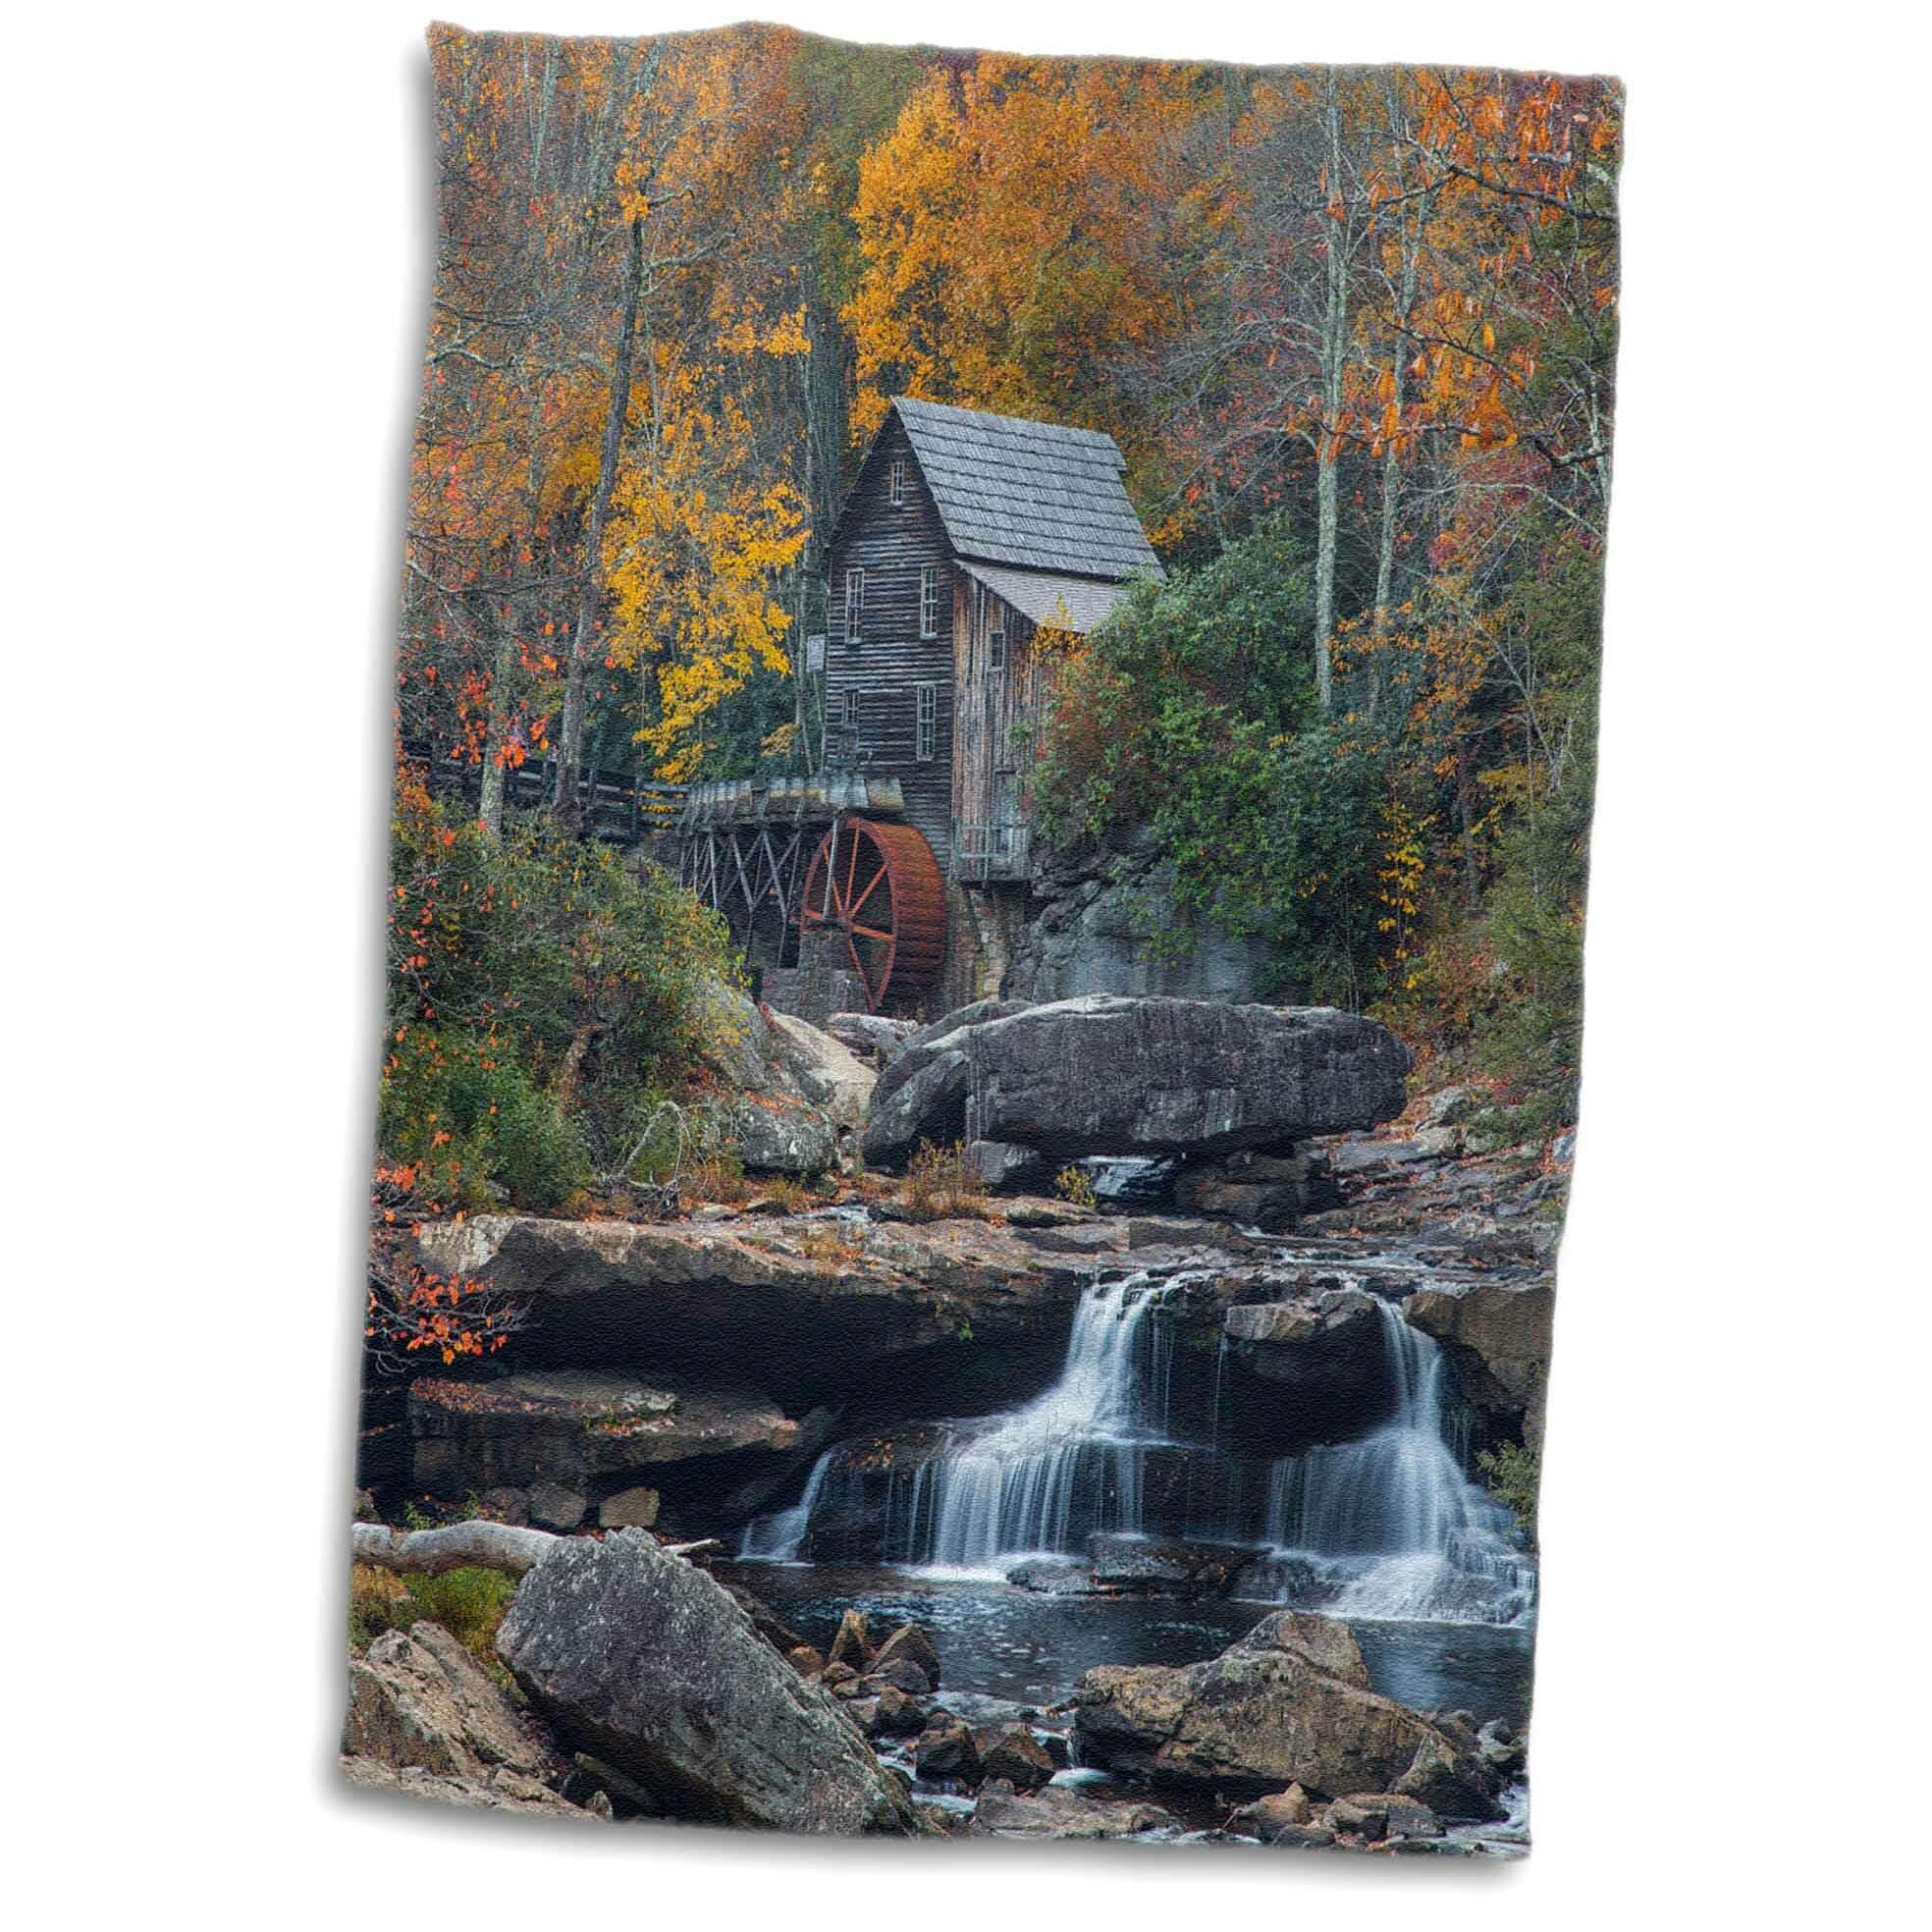 East Urban Home Adalyn The Historic Grist Mill On Glade Creek Babcock Sp West Virginia Usa Hand Towel Wayfair